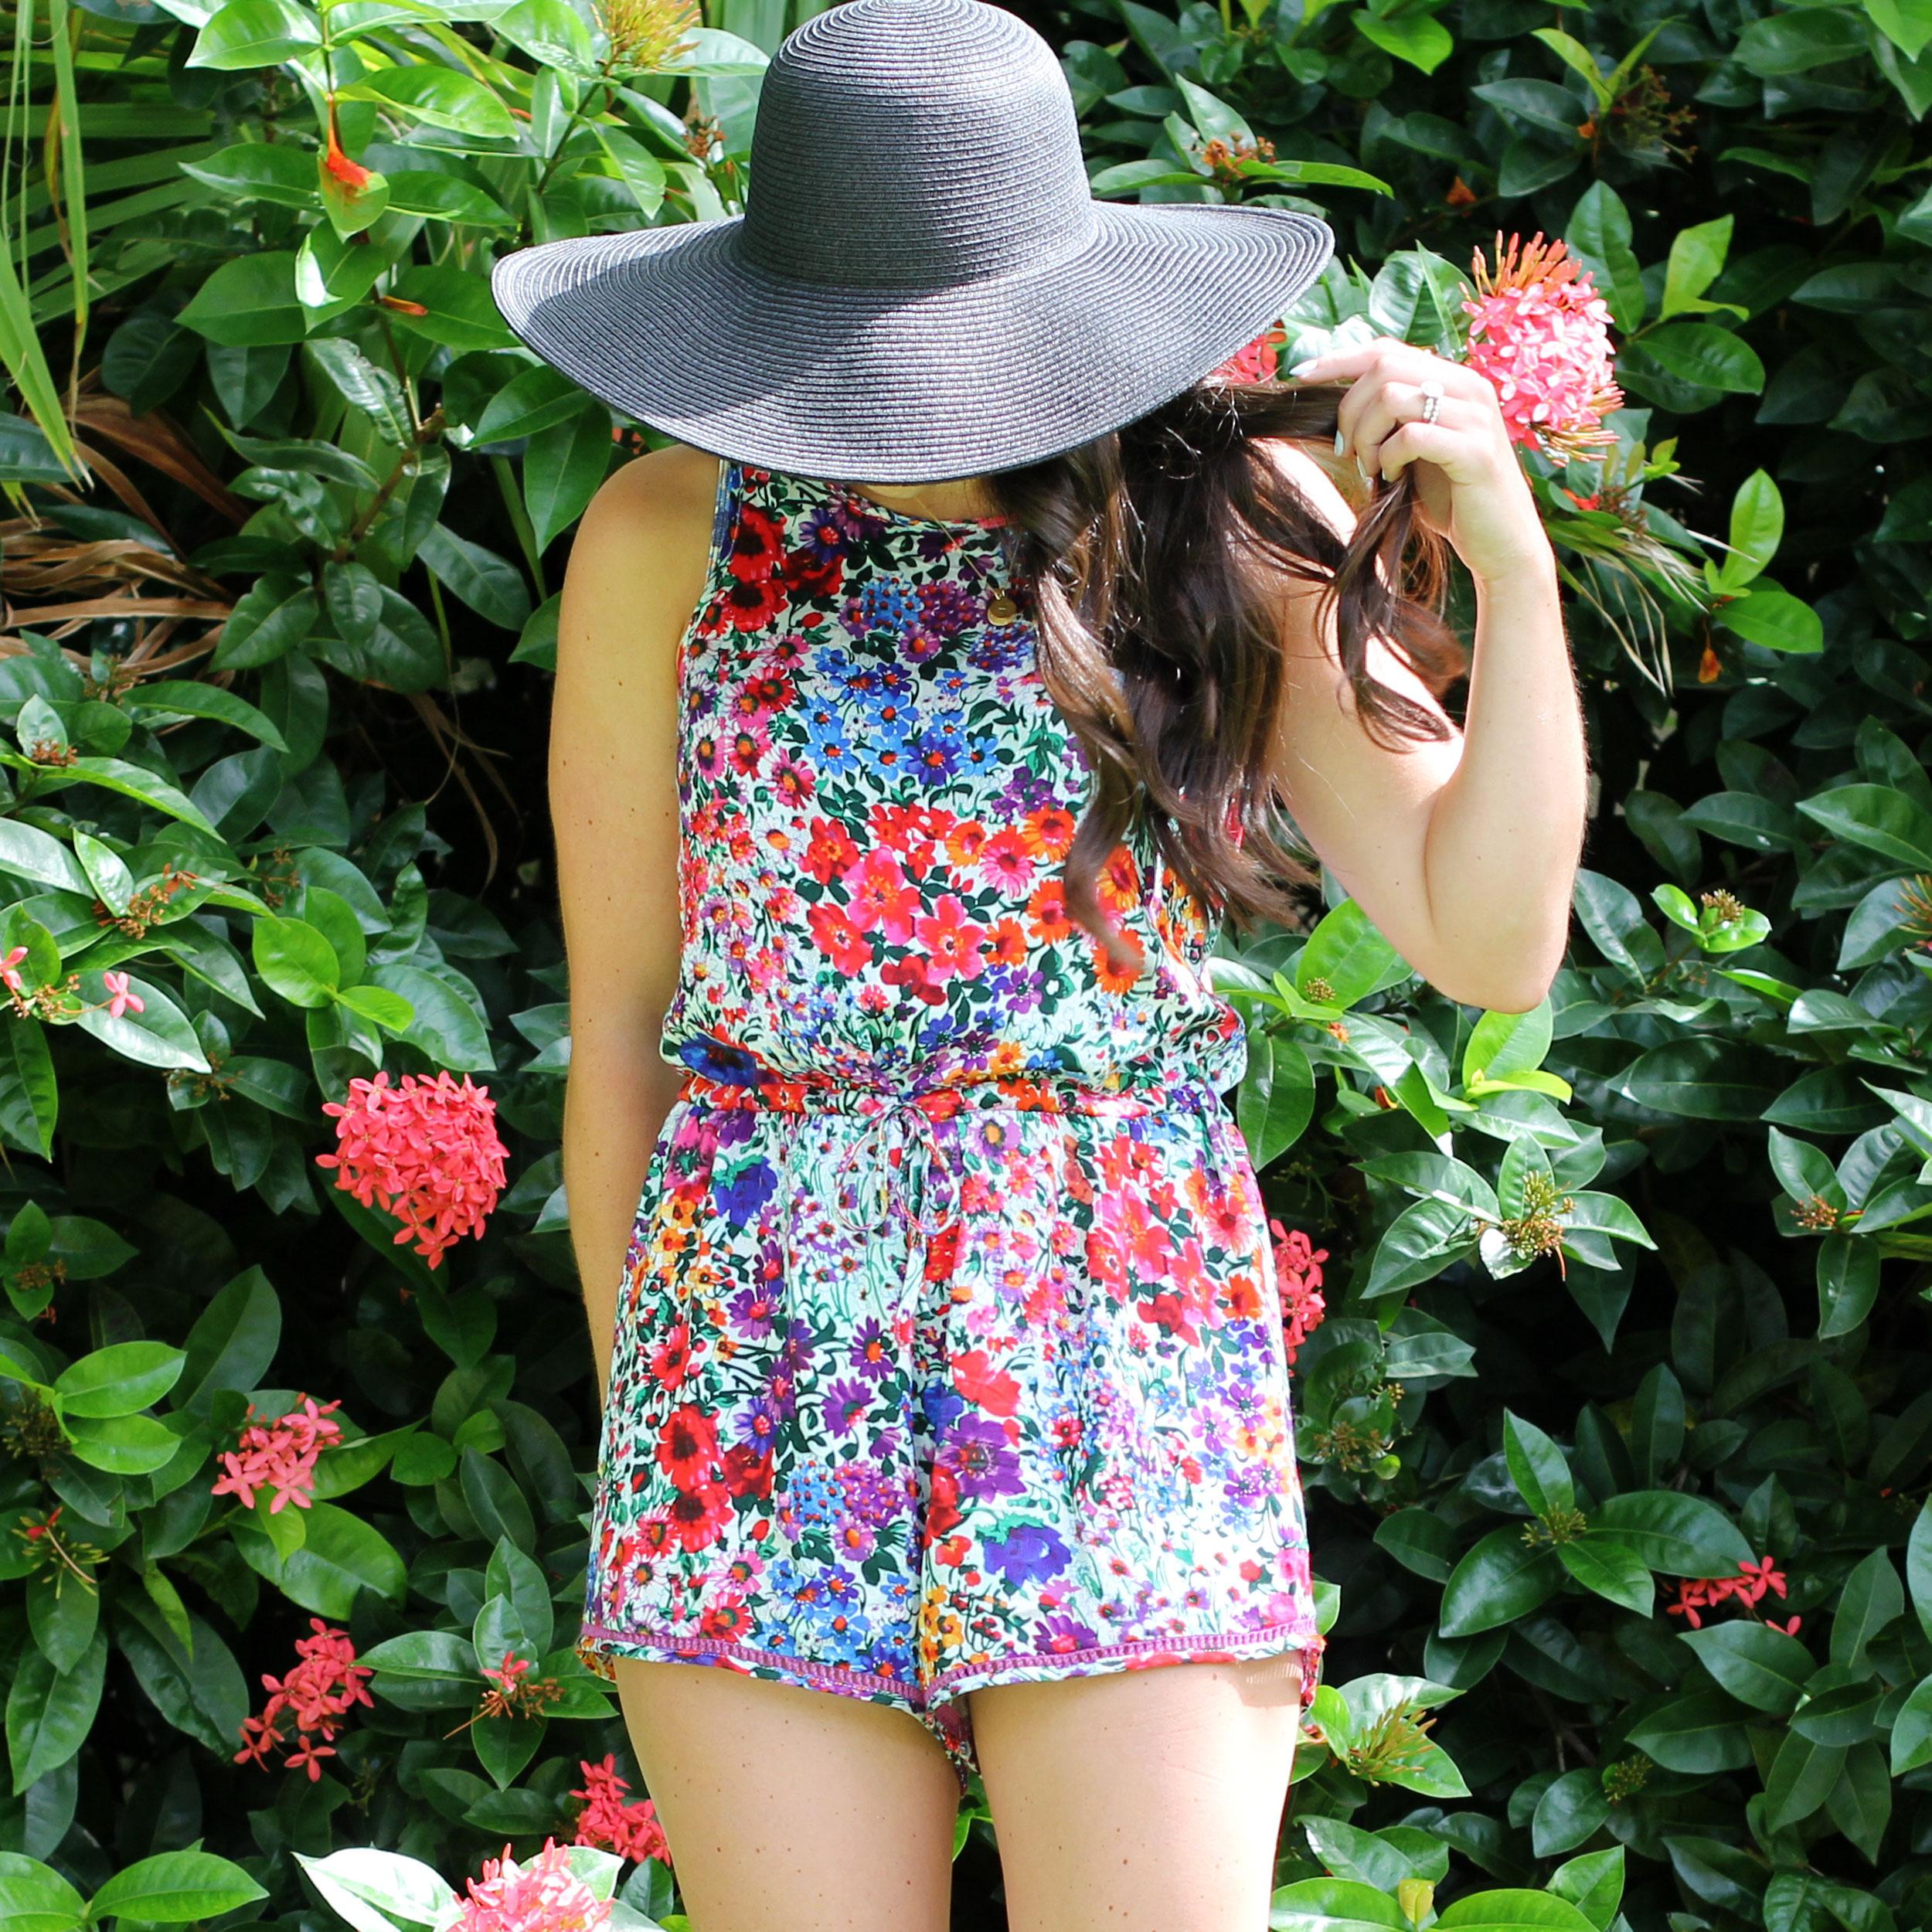 MINKPINK Secret Garden Romper, Summer Style, Beach Hat, J.Crew Floppy Hat, Ray-Ban Aviator Sunglasses, Beach Fashion